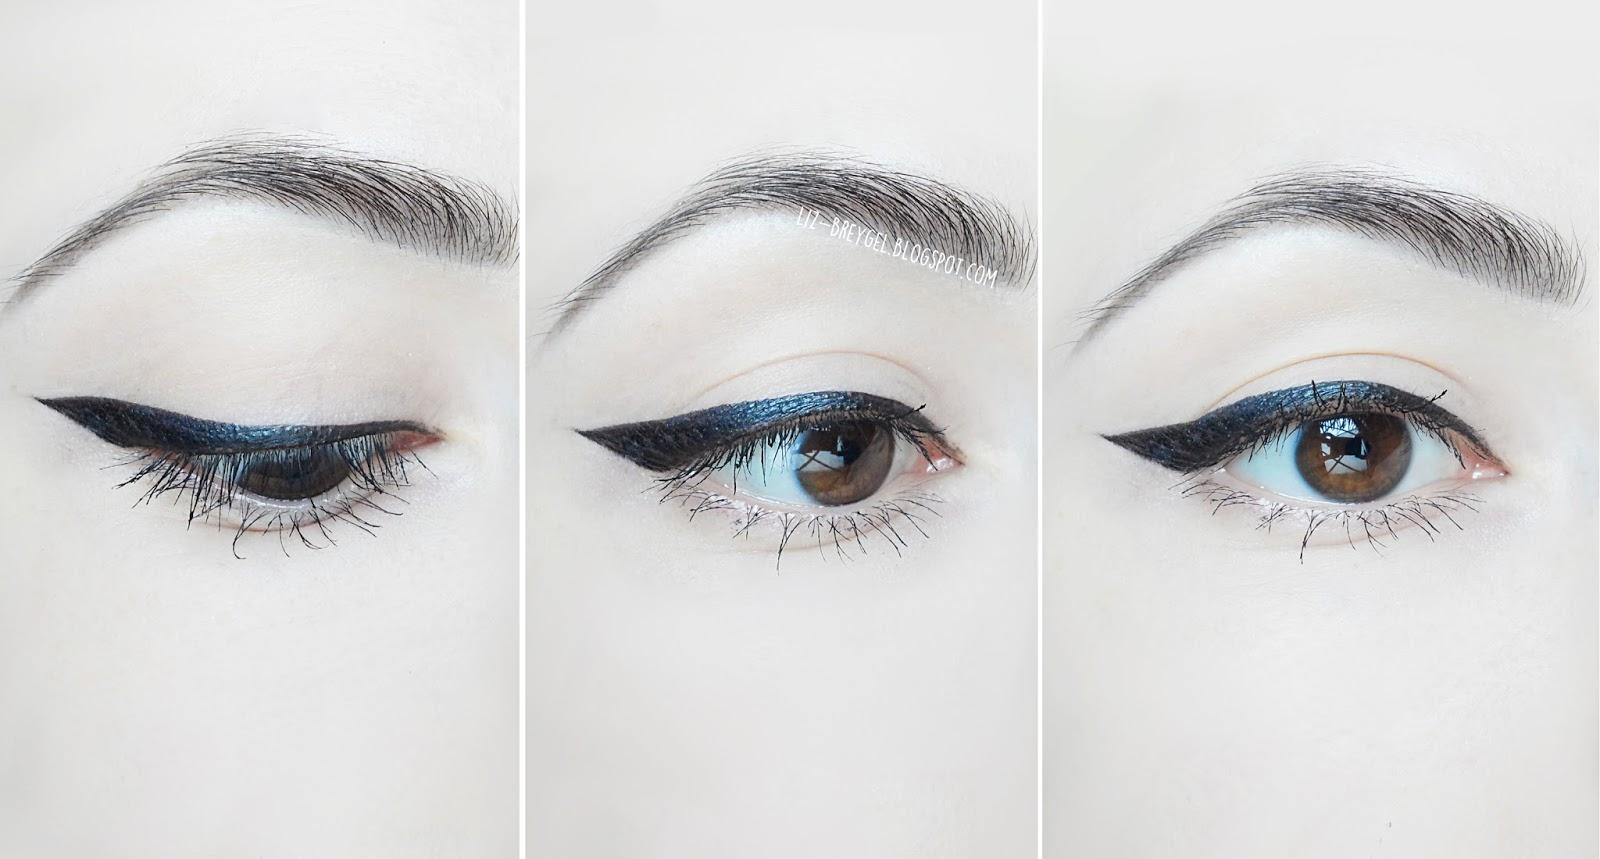 eye with cat eyeliner close up